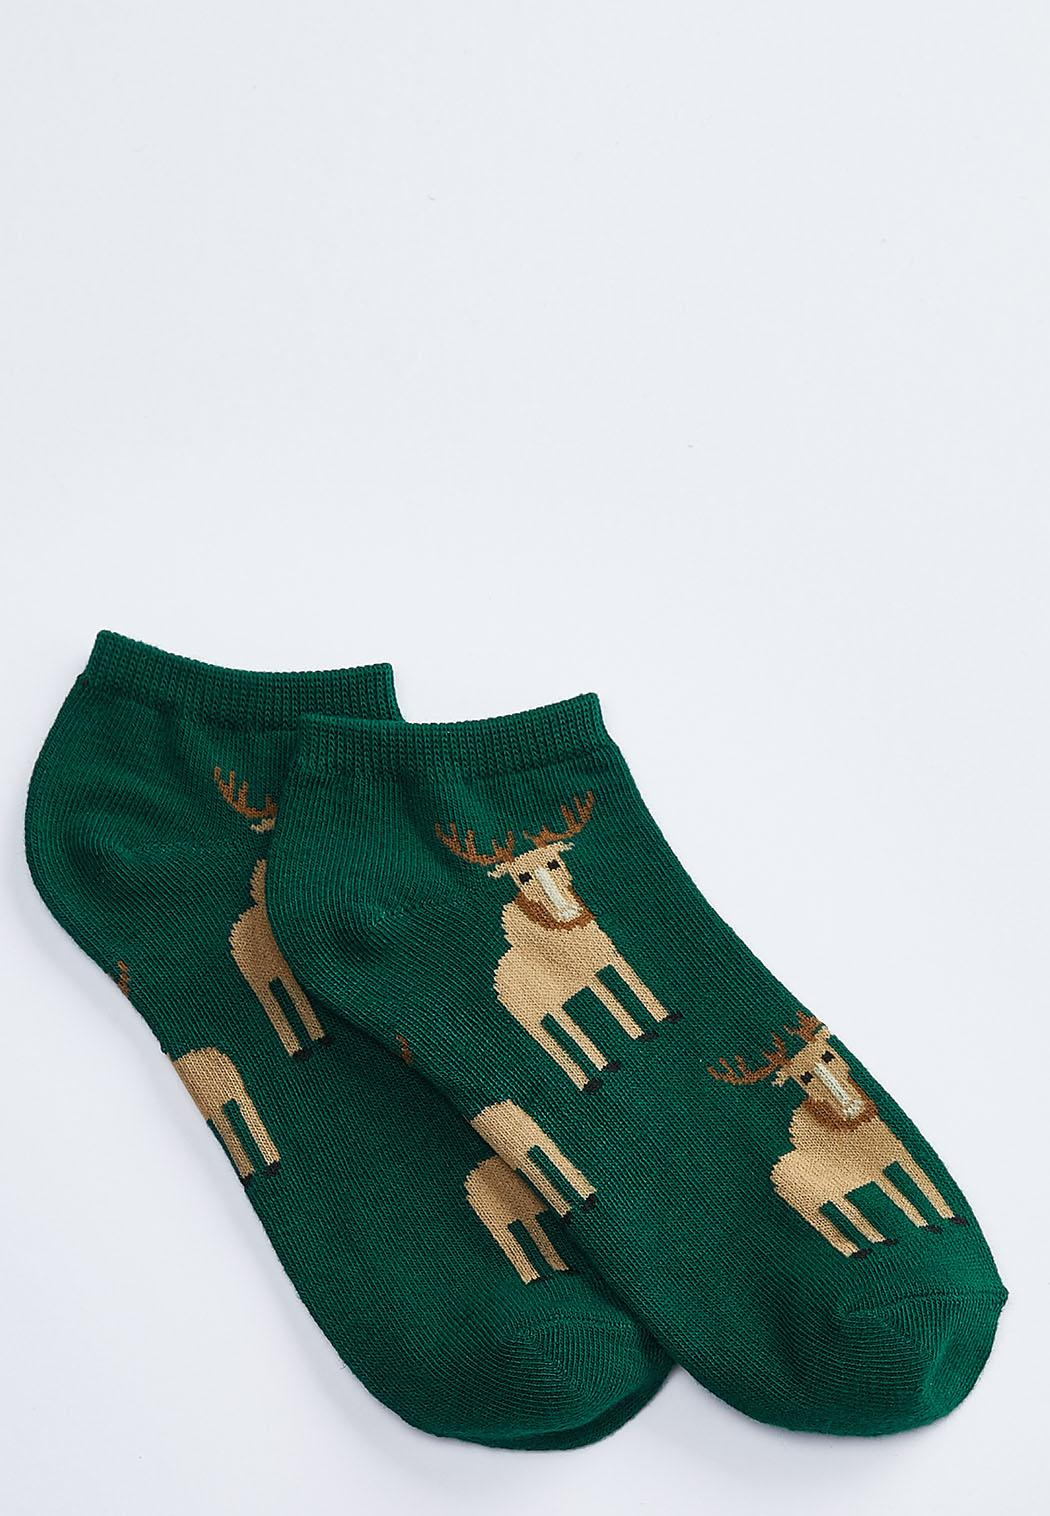 Moose Ankle Socks